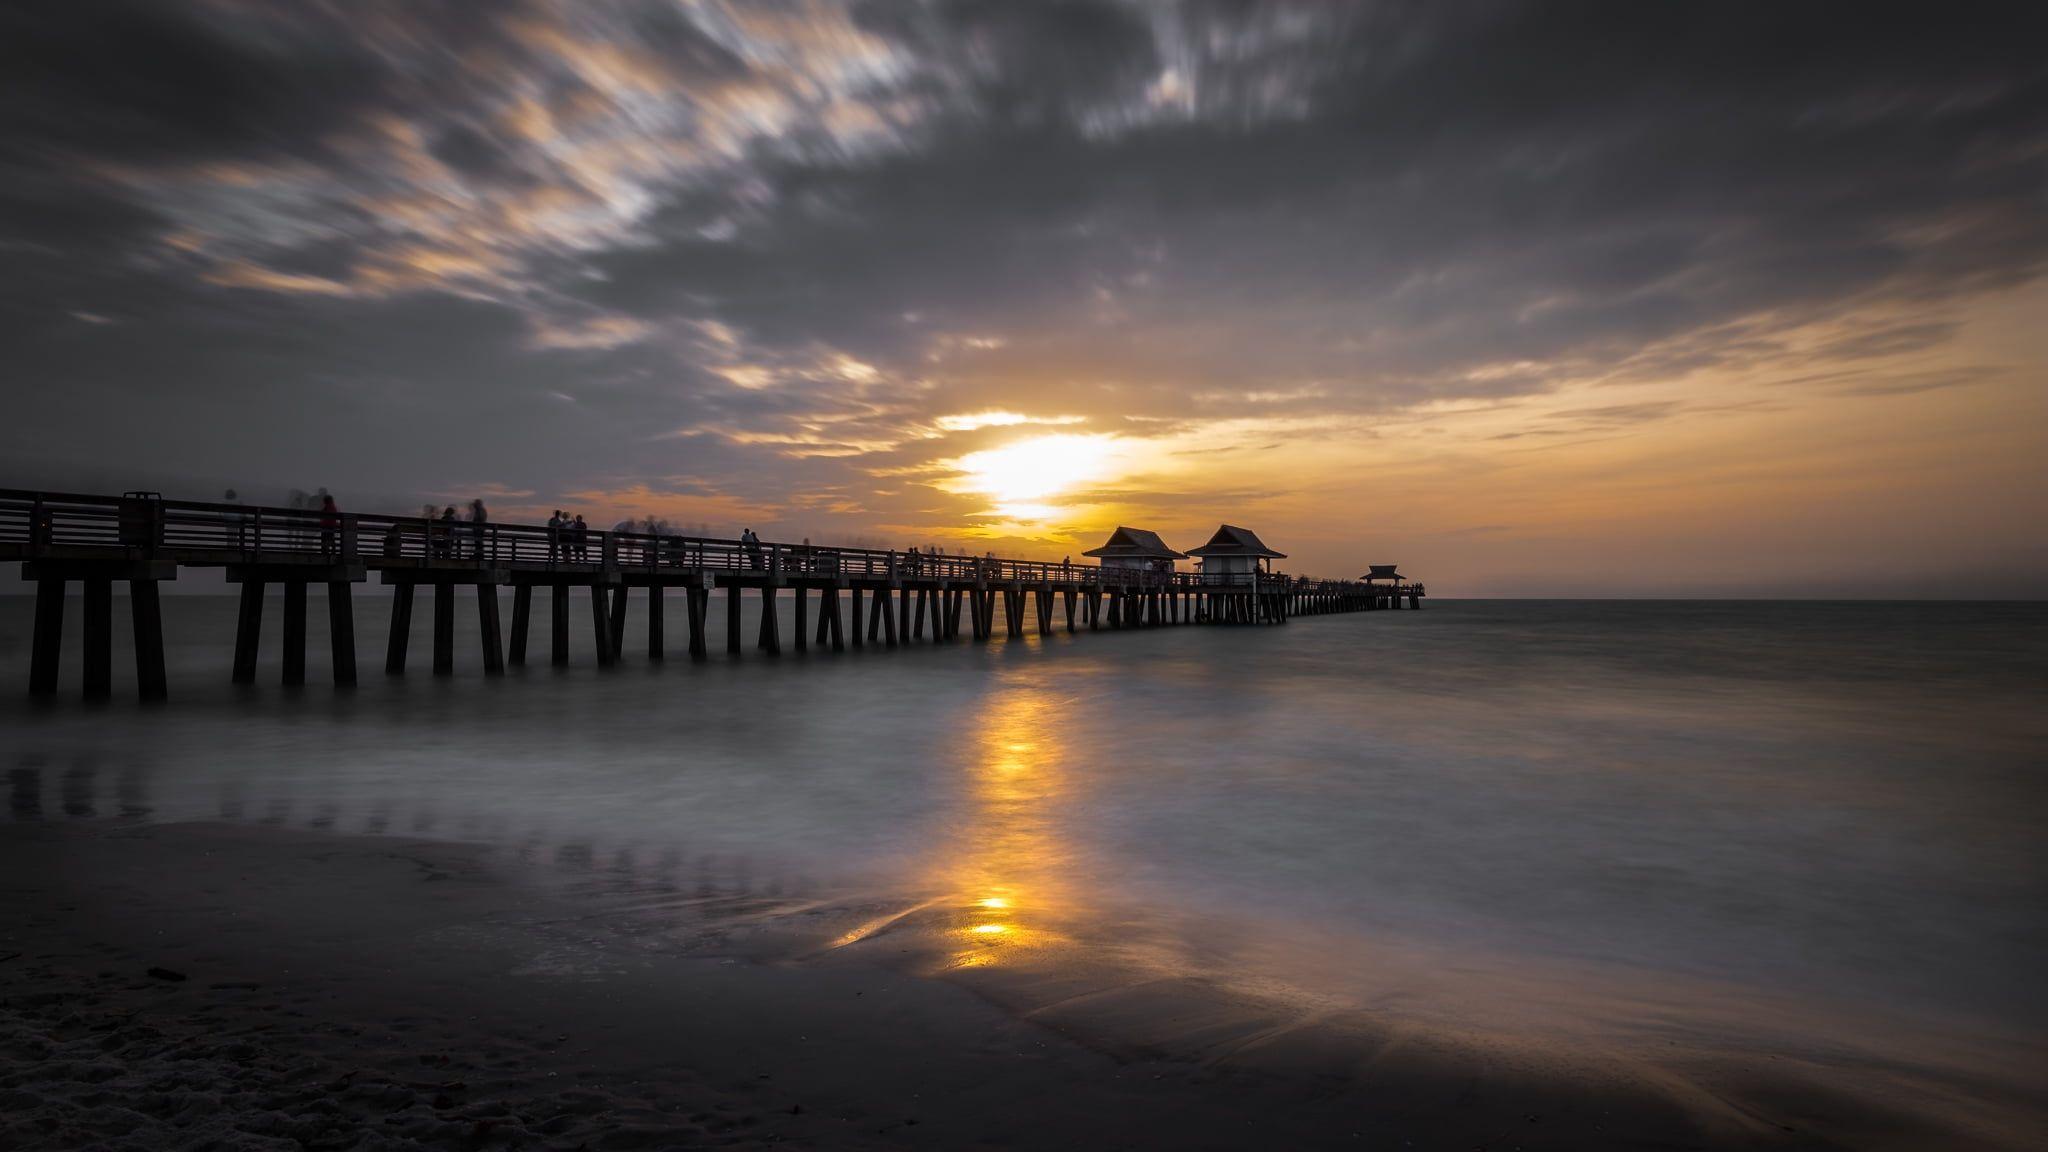 Wallpaper Naples Florida: Top Free Naples Backgrounds